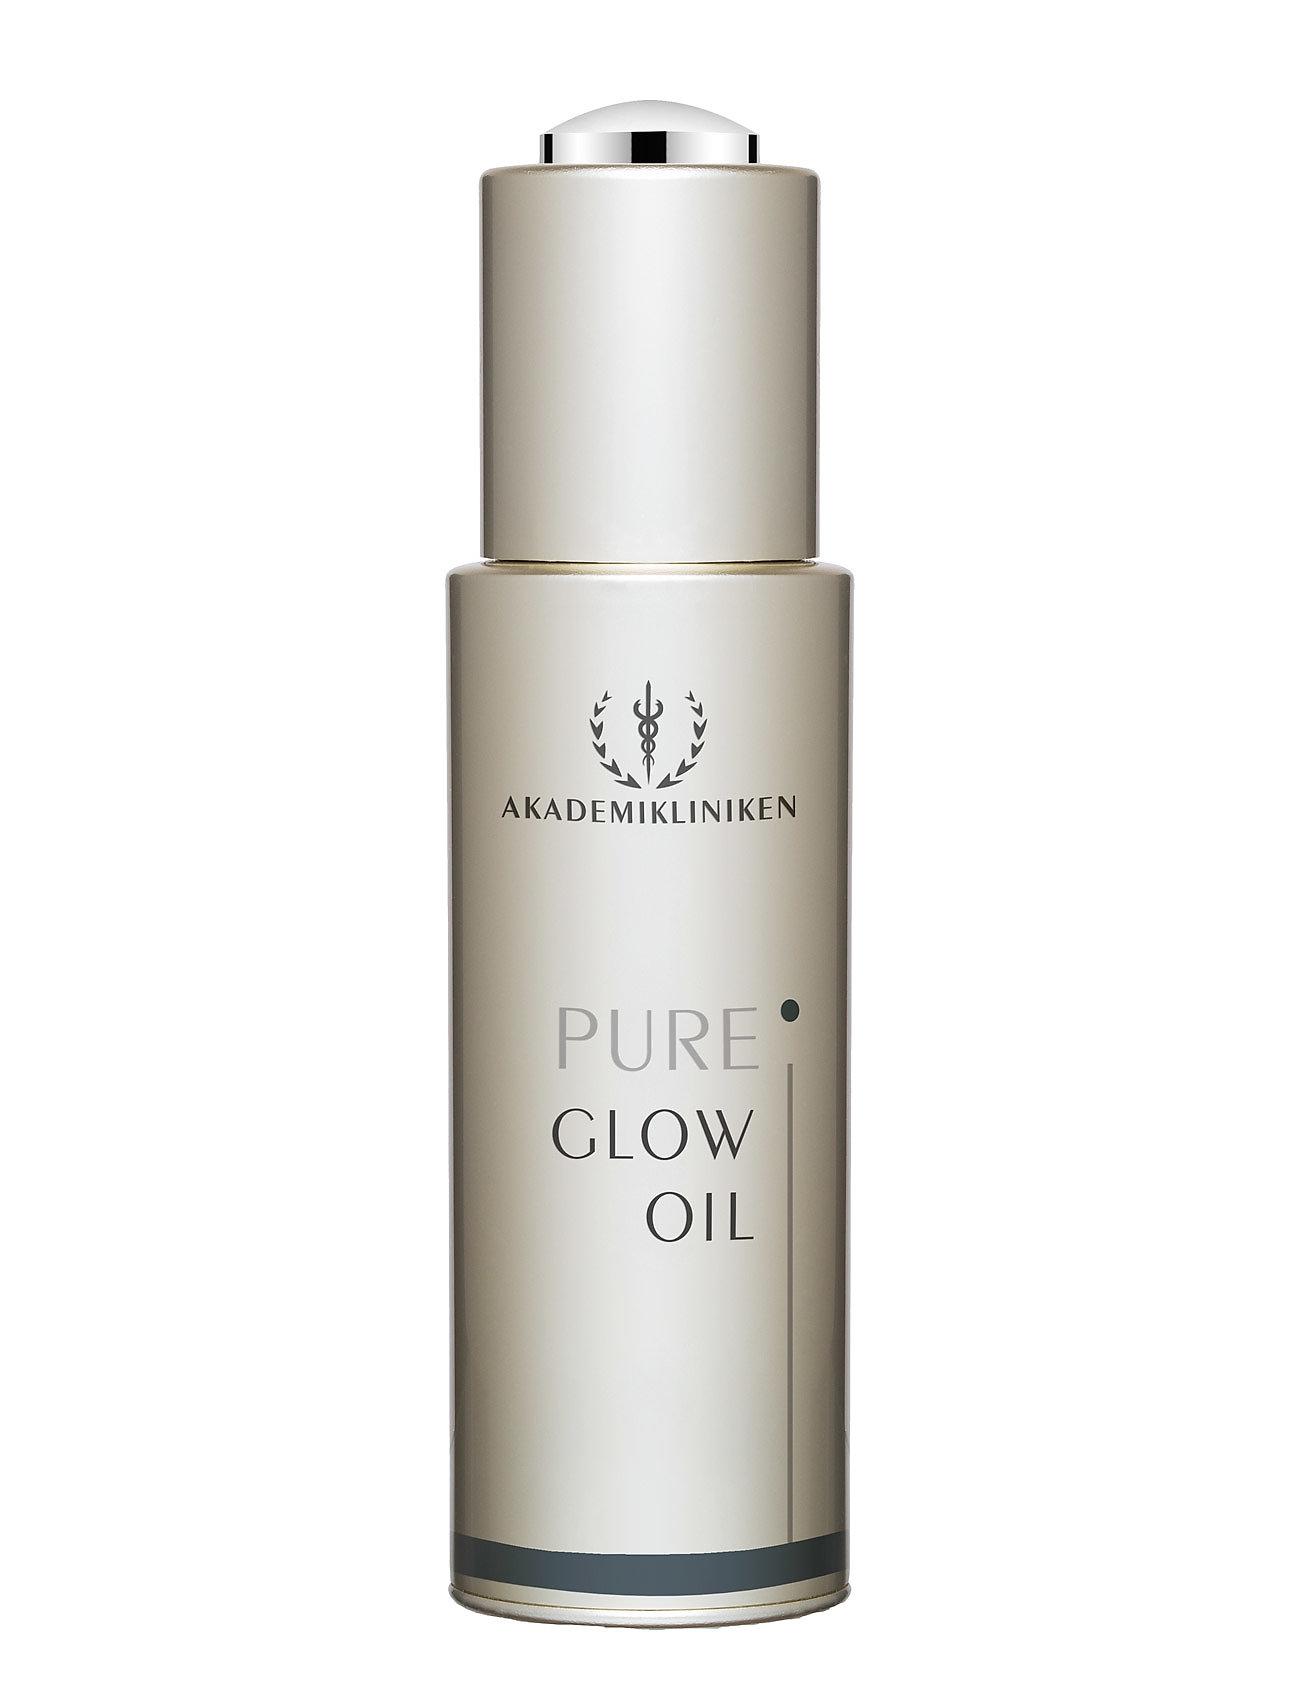 Akademikliniken Skincare Pure Glow Oil - CLEAR